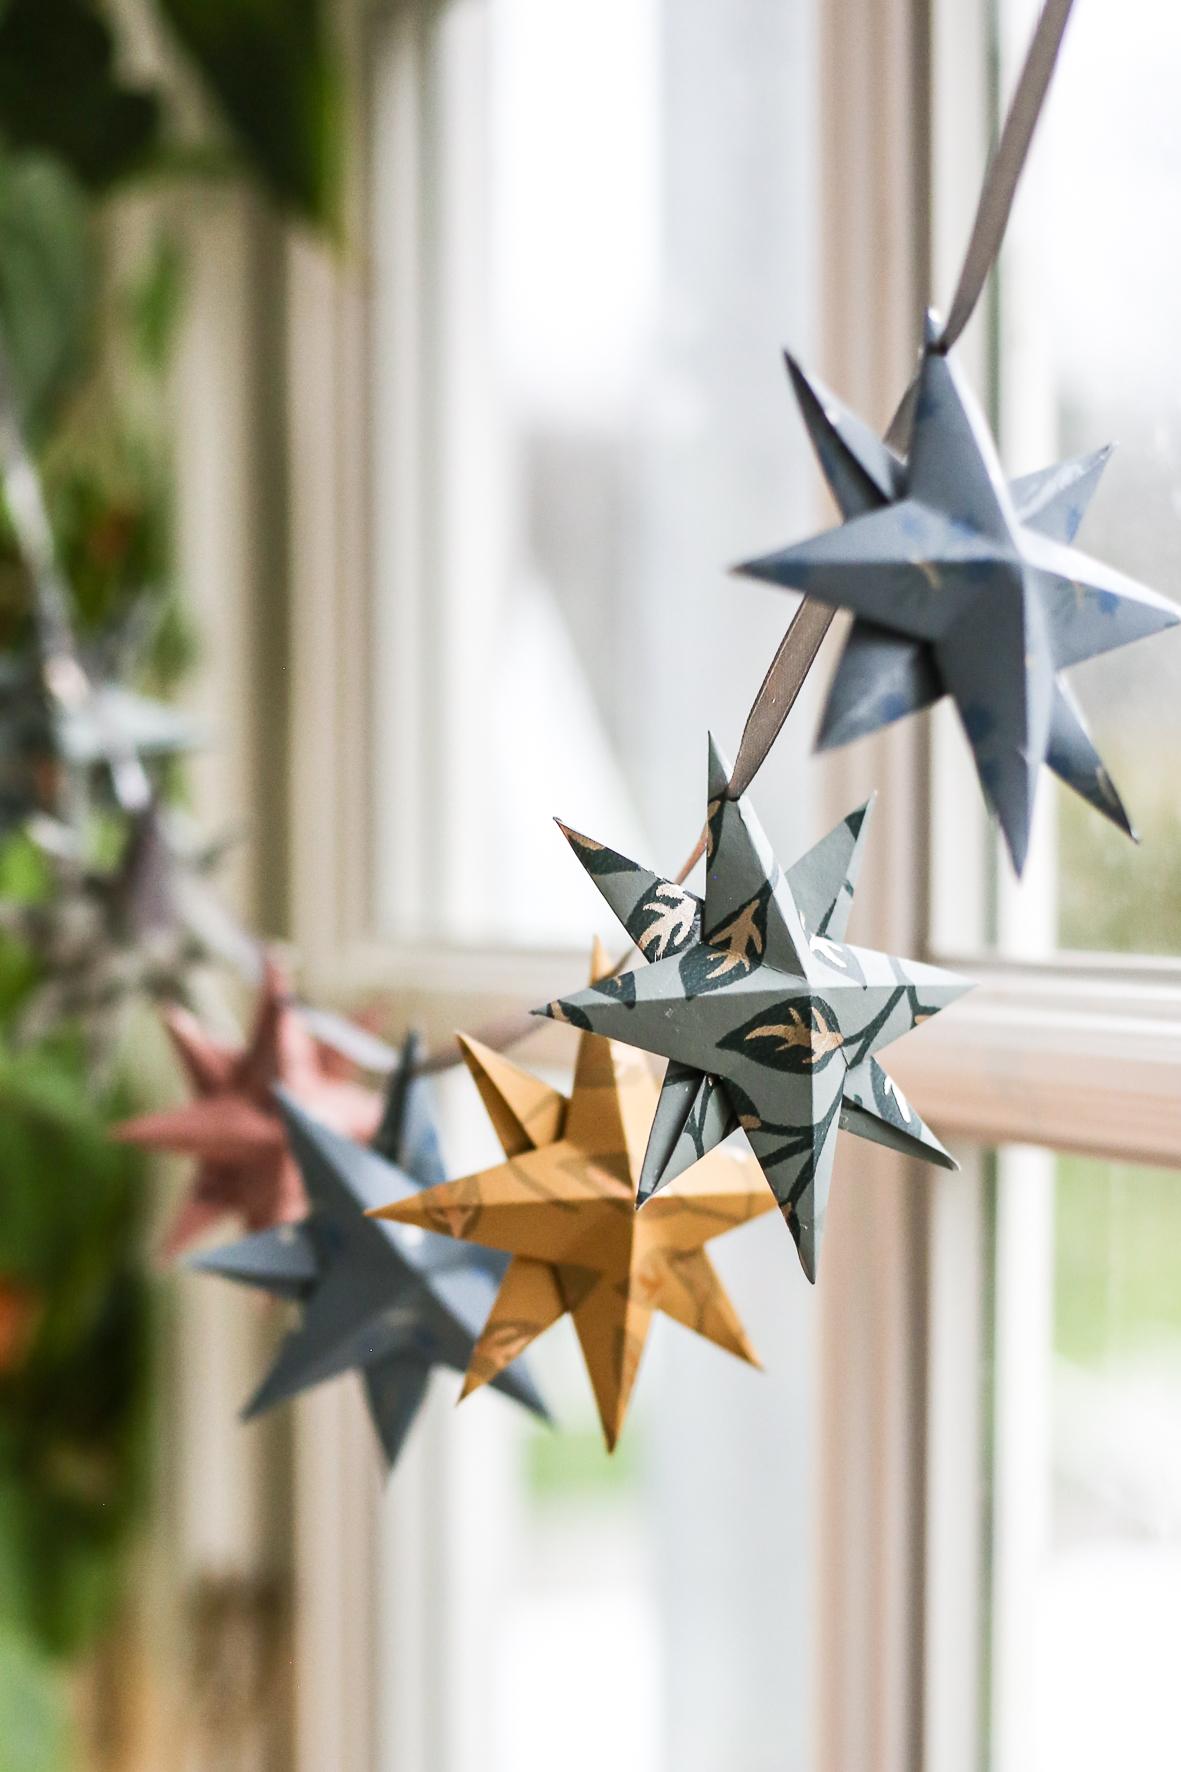 Christmas_star_HannaWendelbo-13.jpg